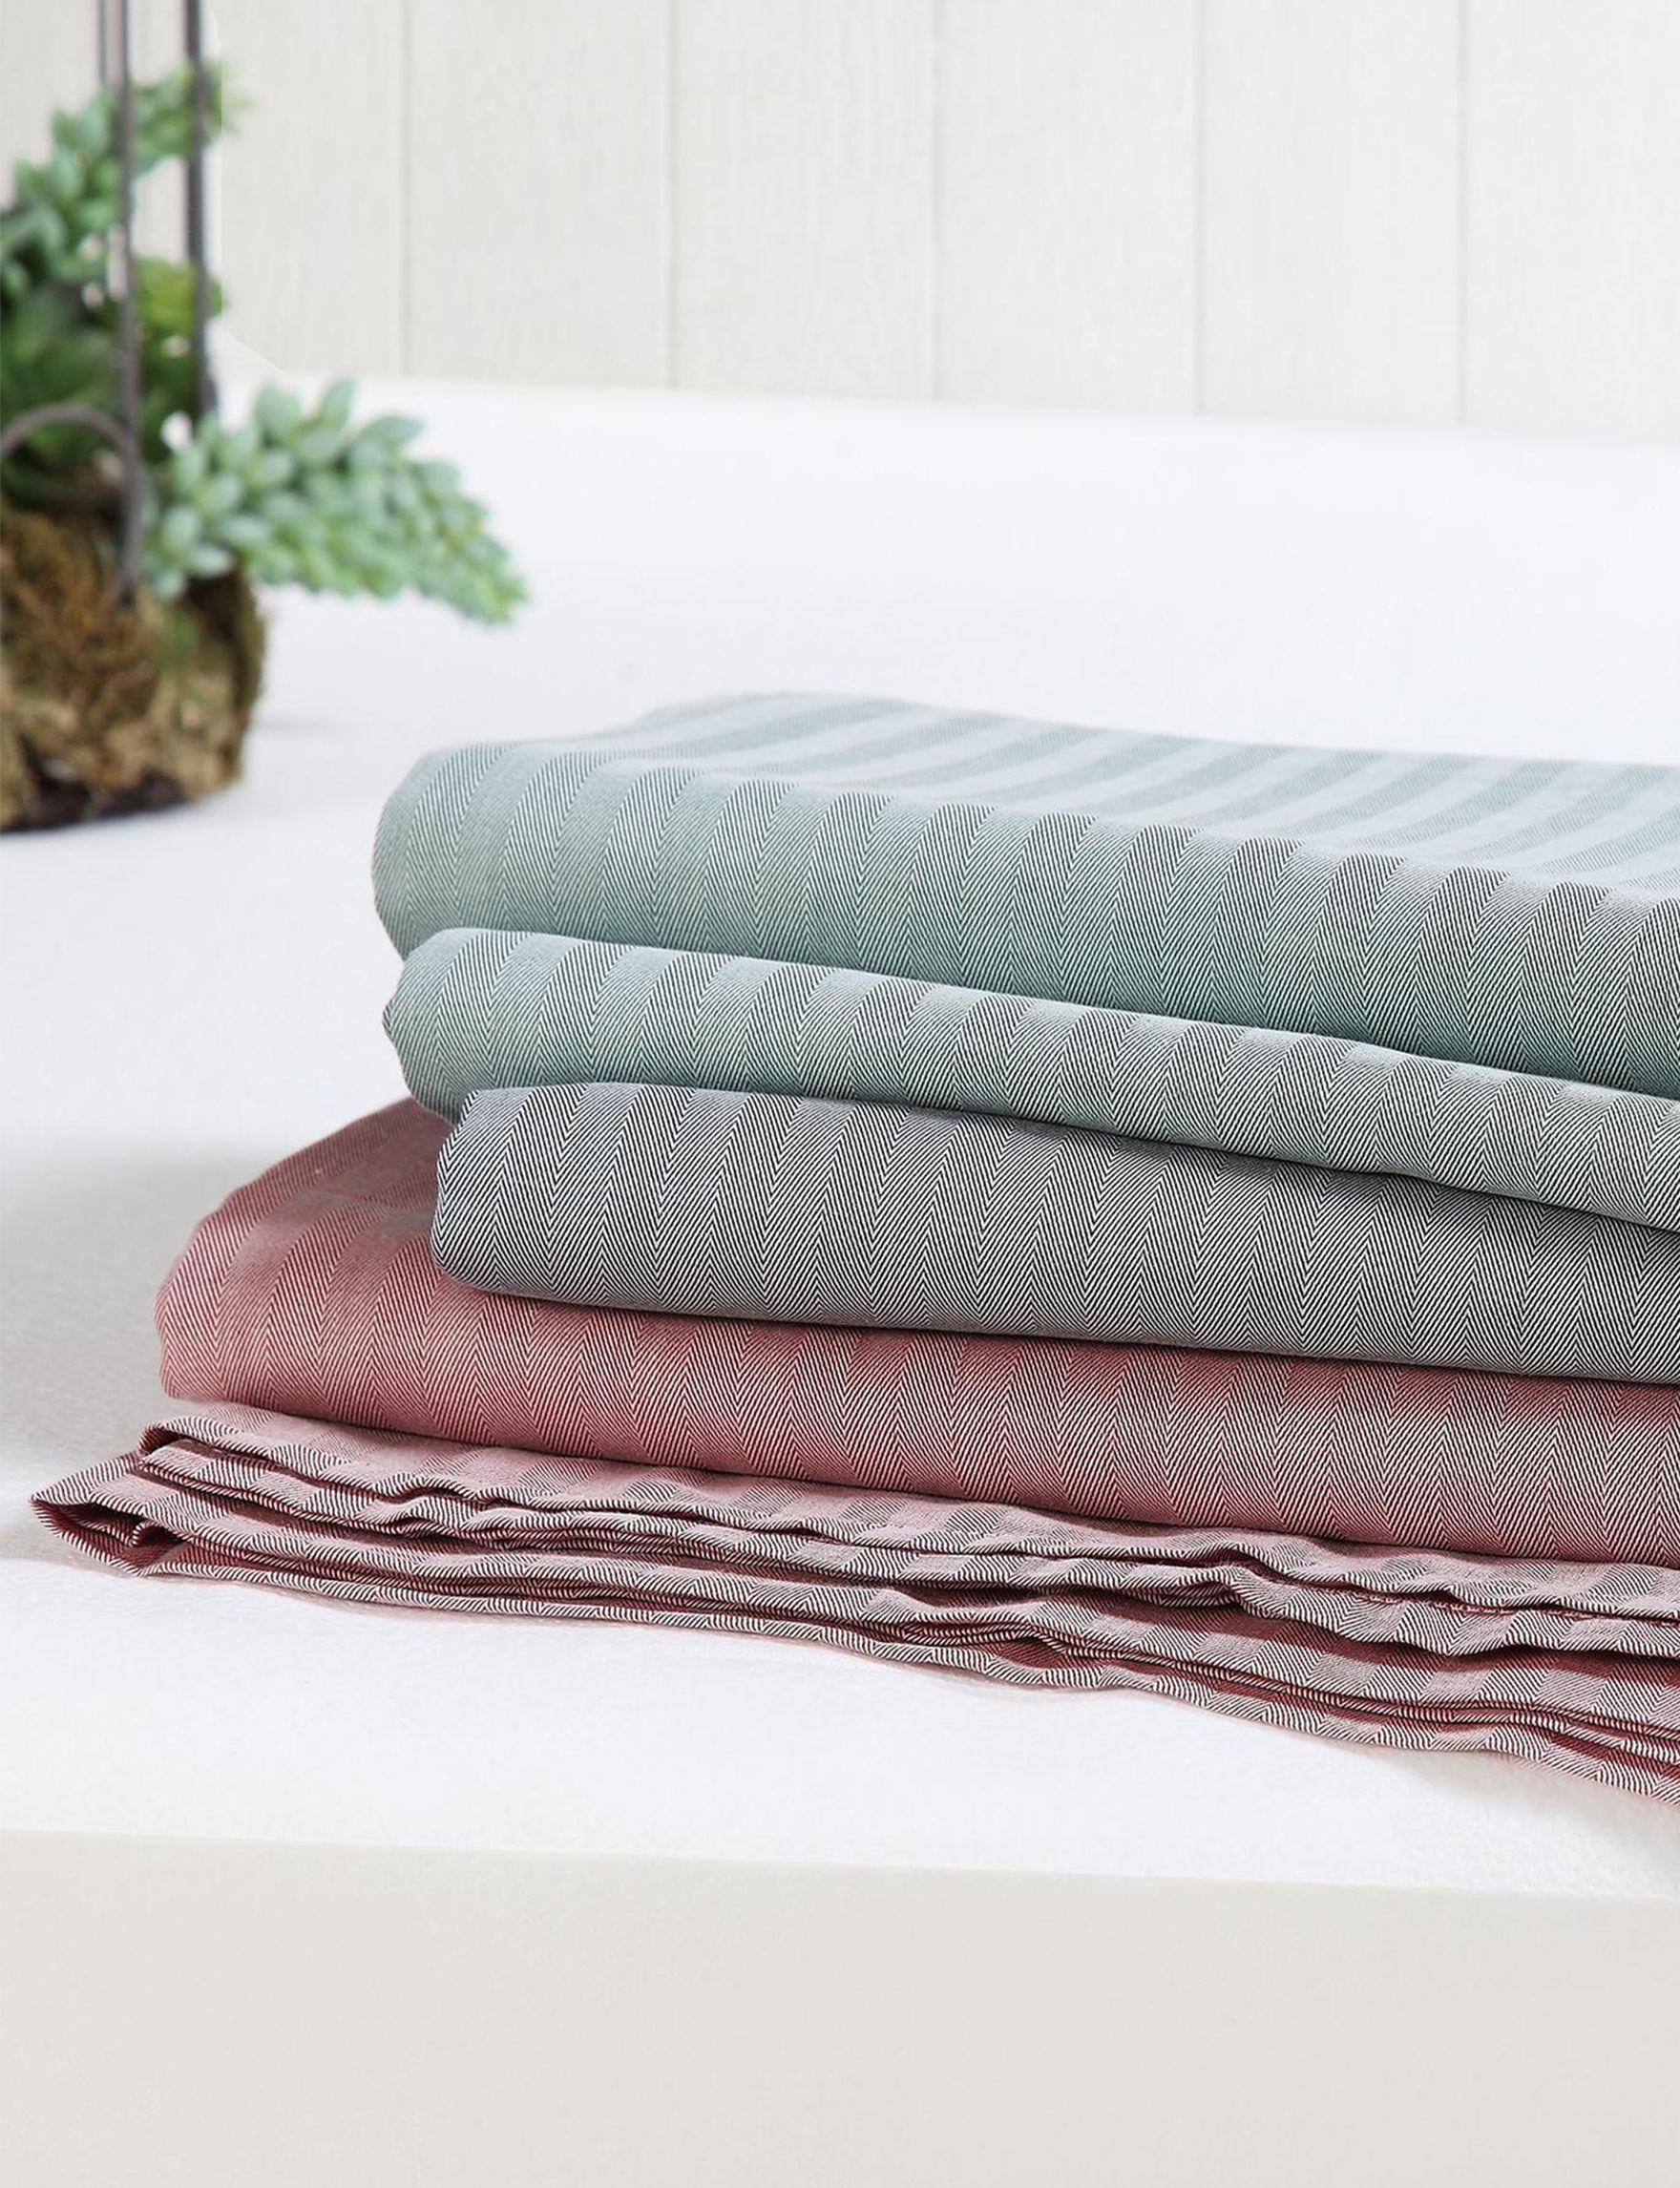 Brooklyn Loom Green Sheets & Pillowcases